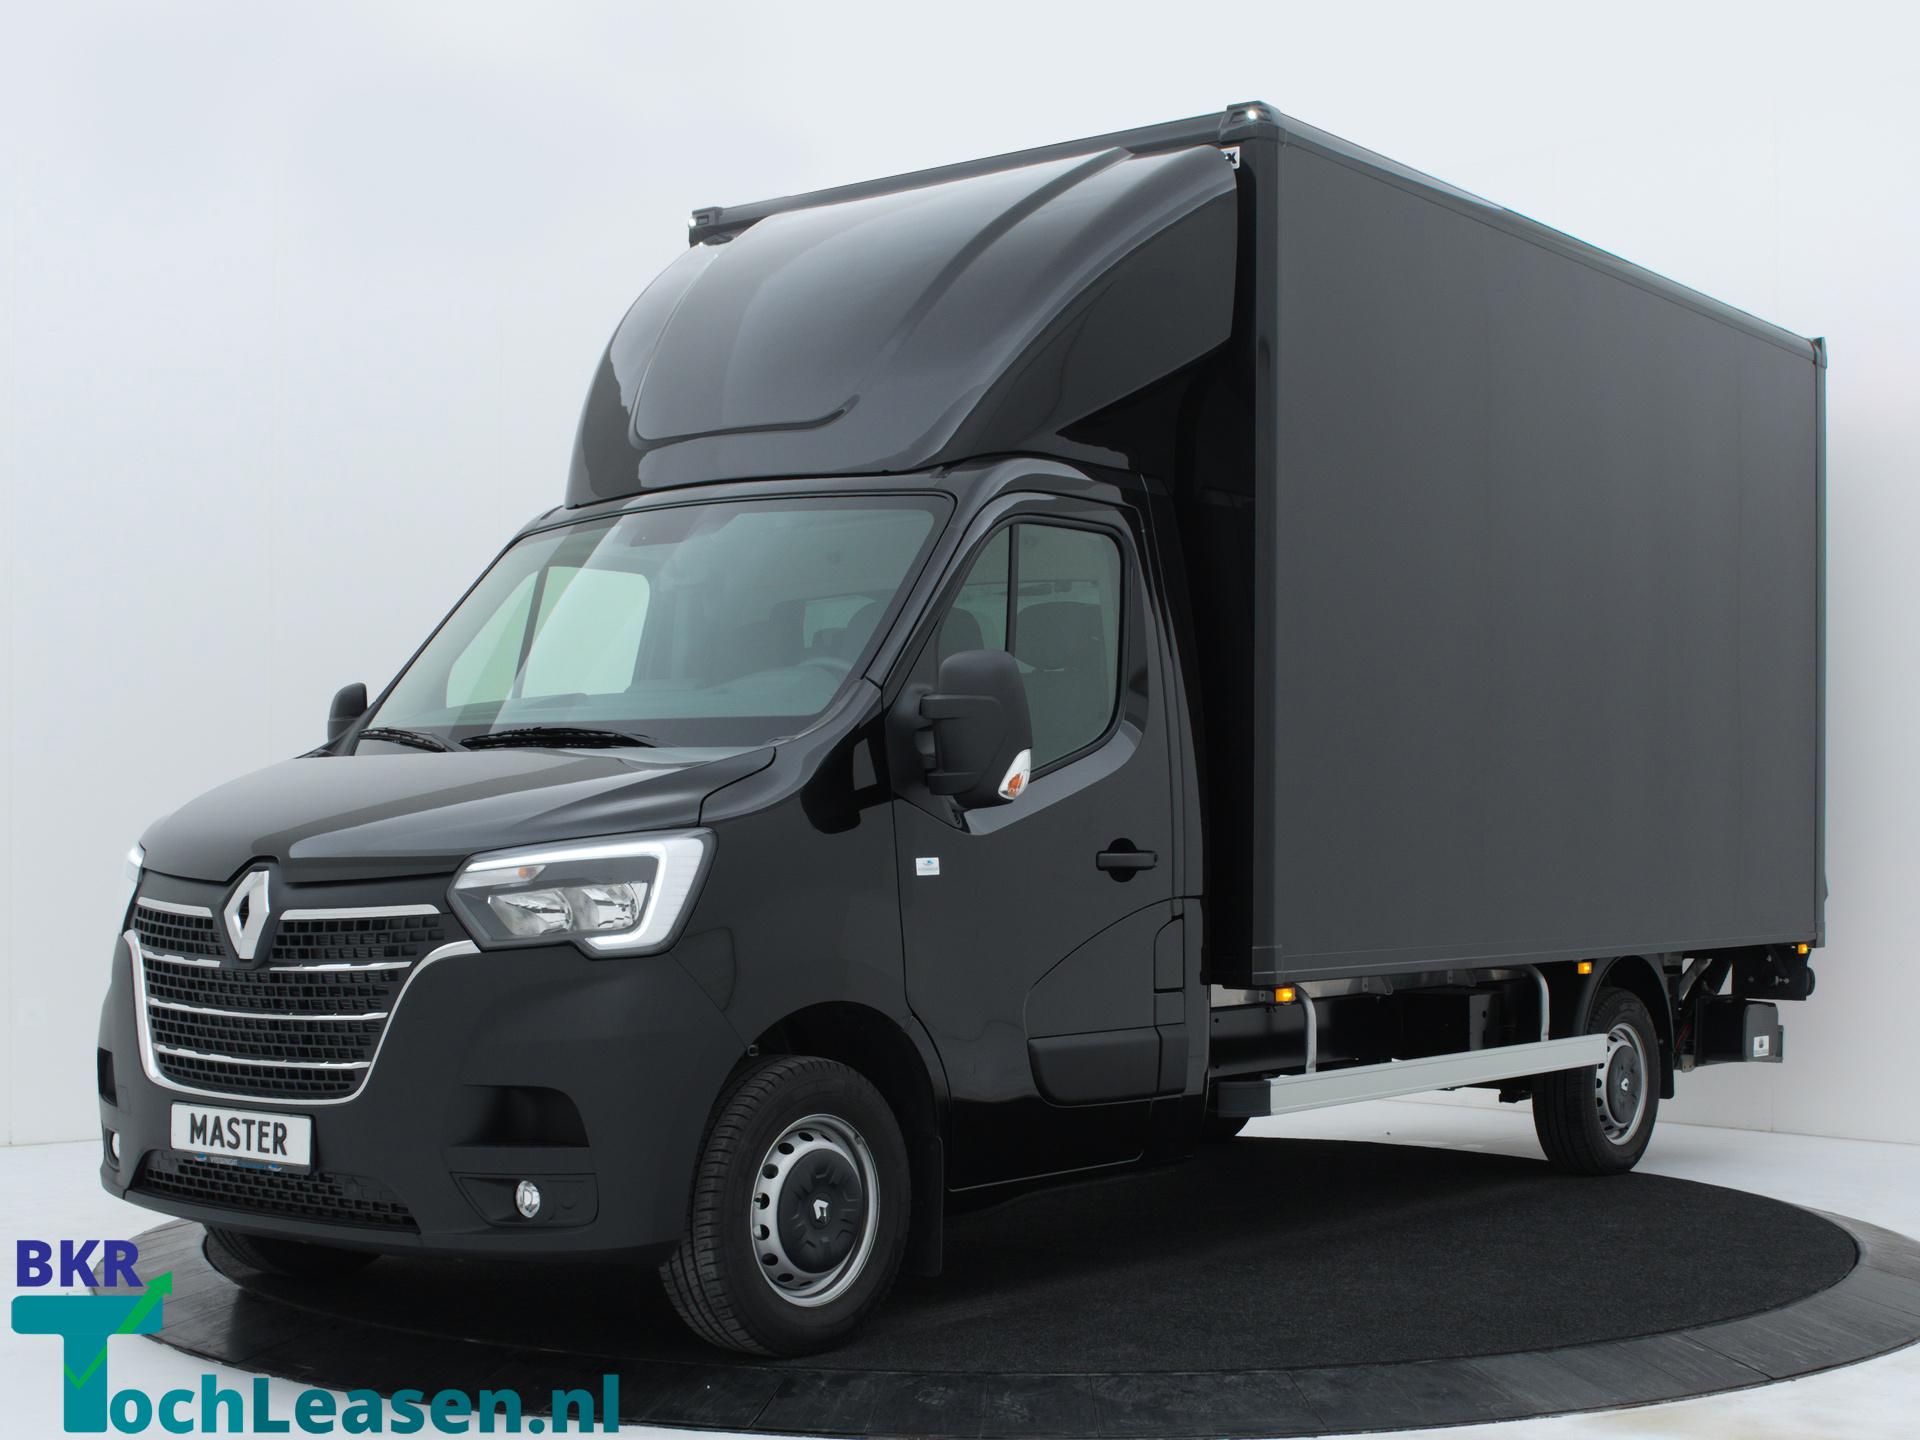 Renault Master bakwagen voorkant zwart BKR toch Leasen